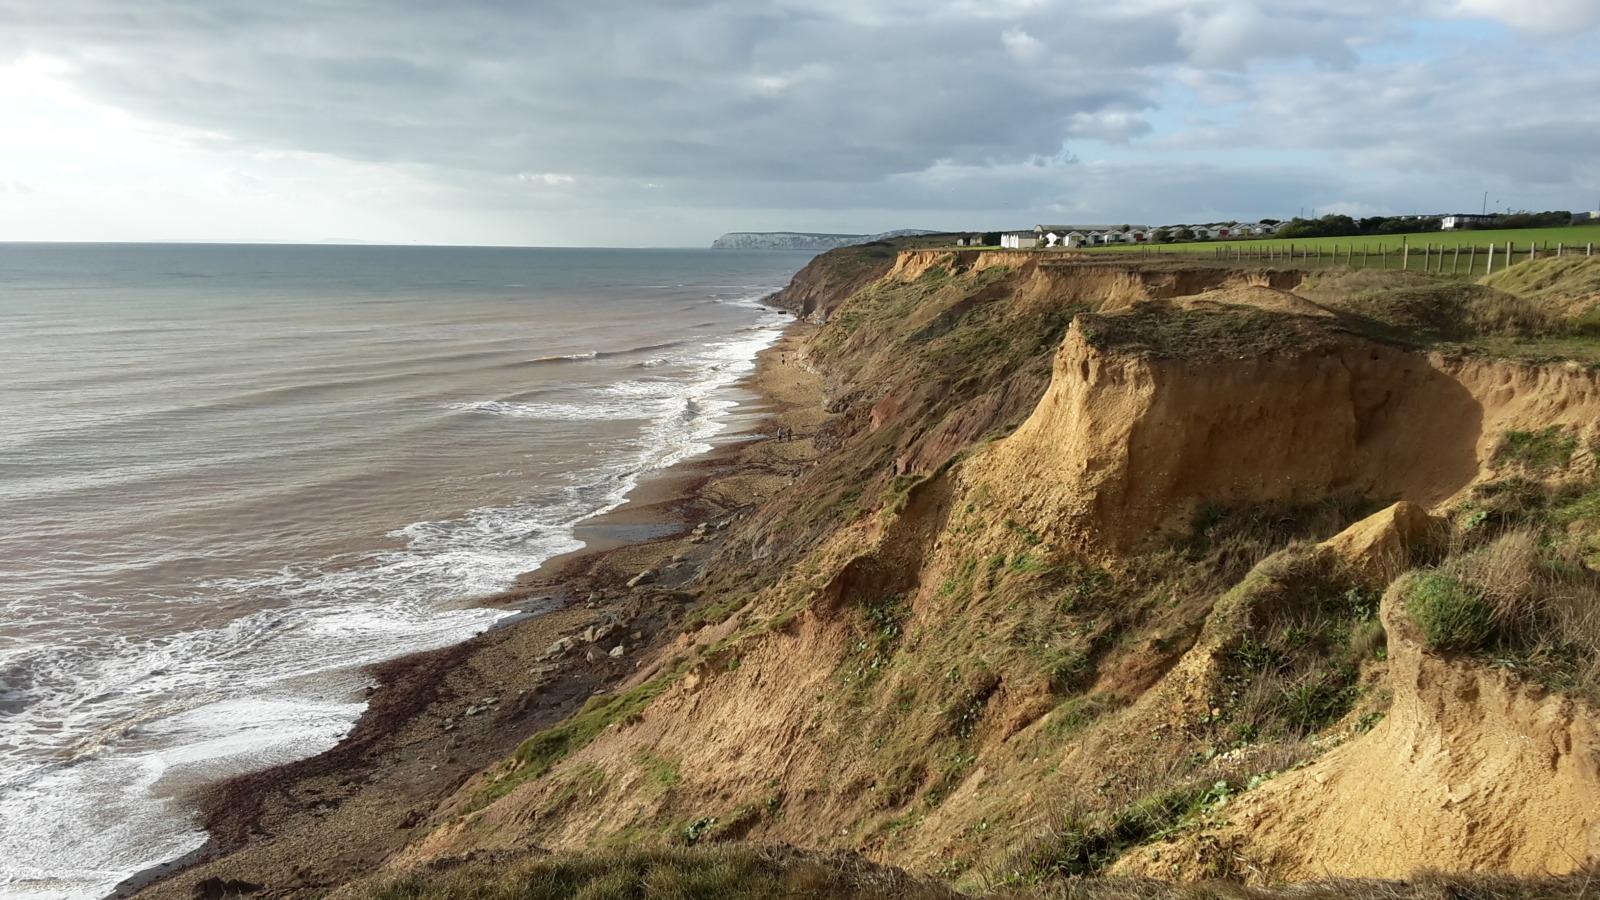 Brighstone cliffs